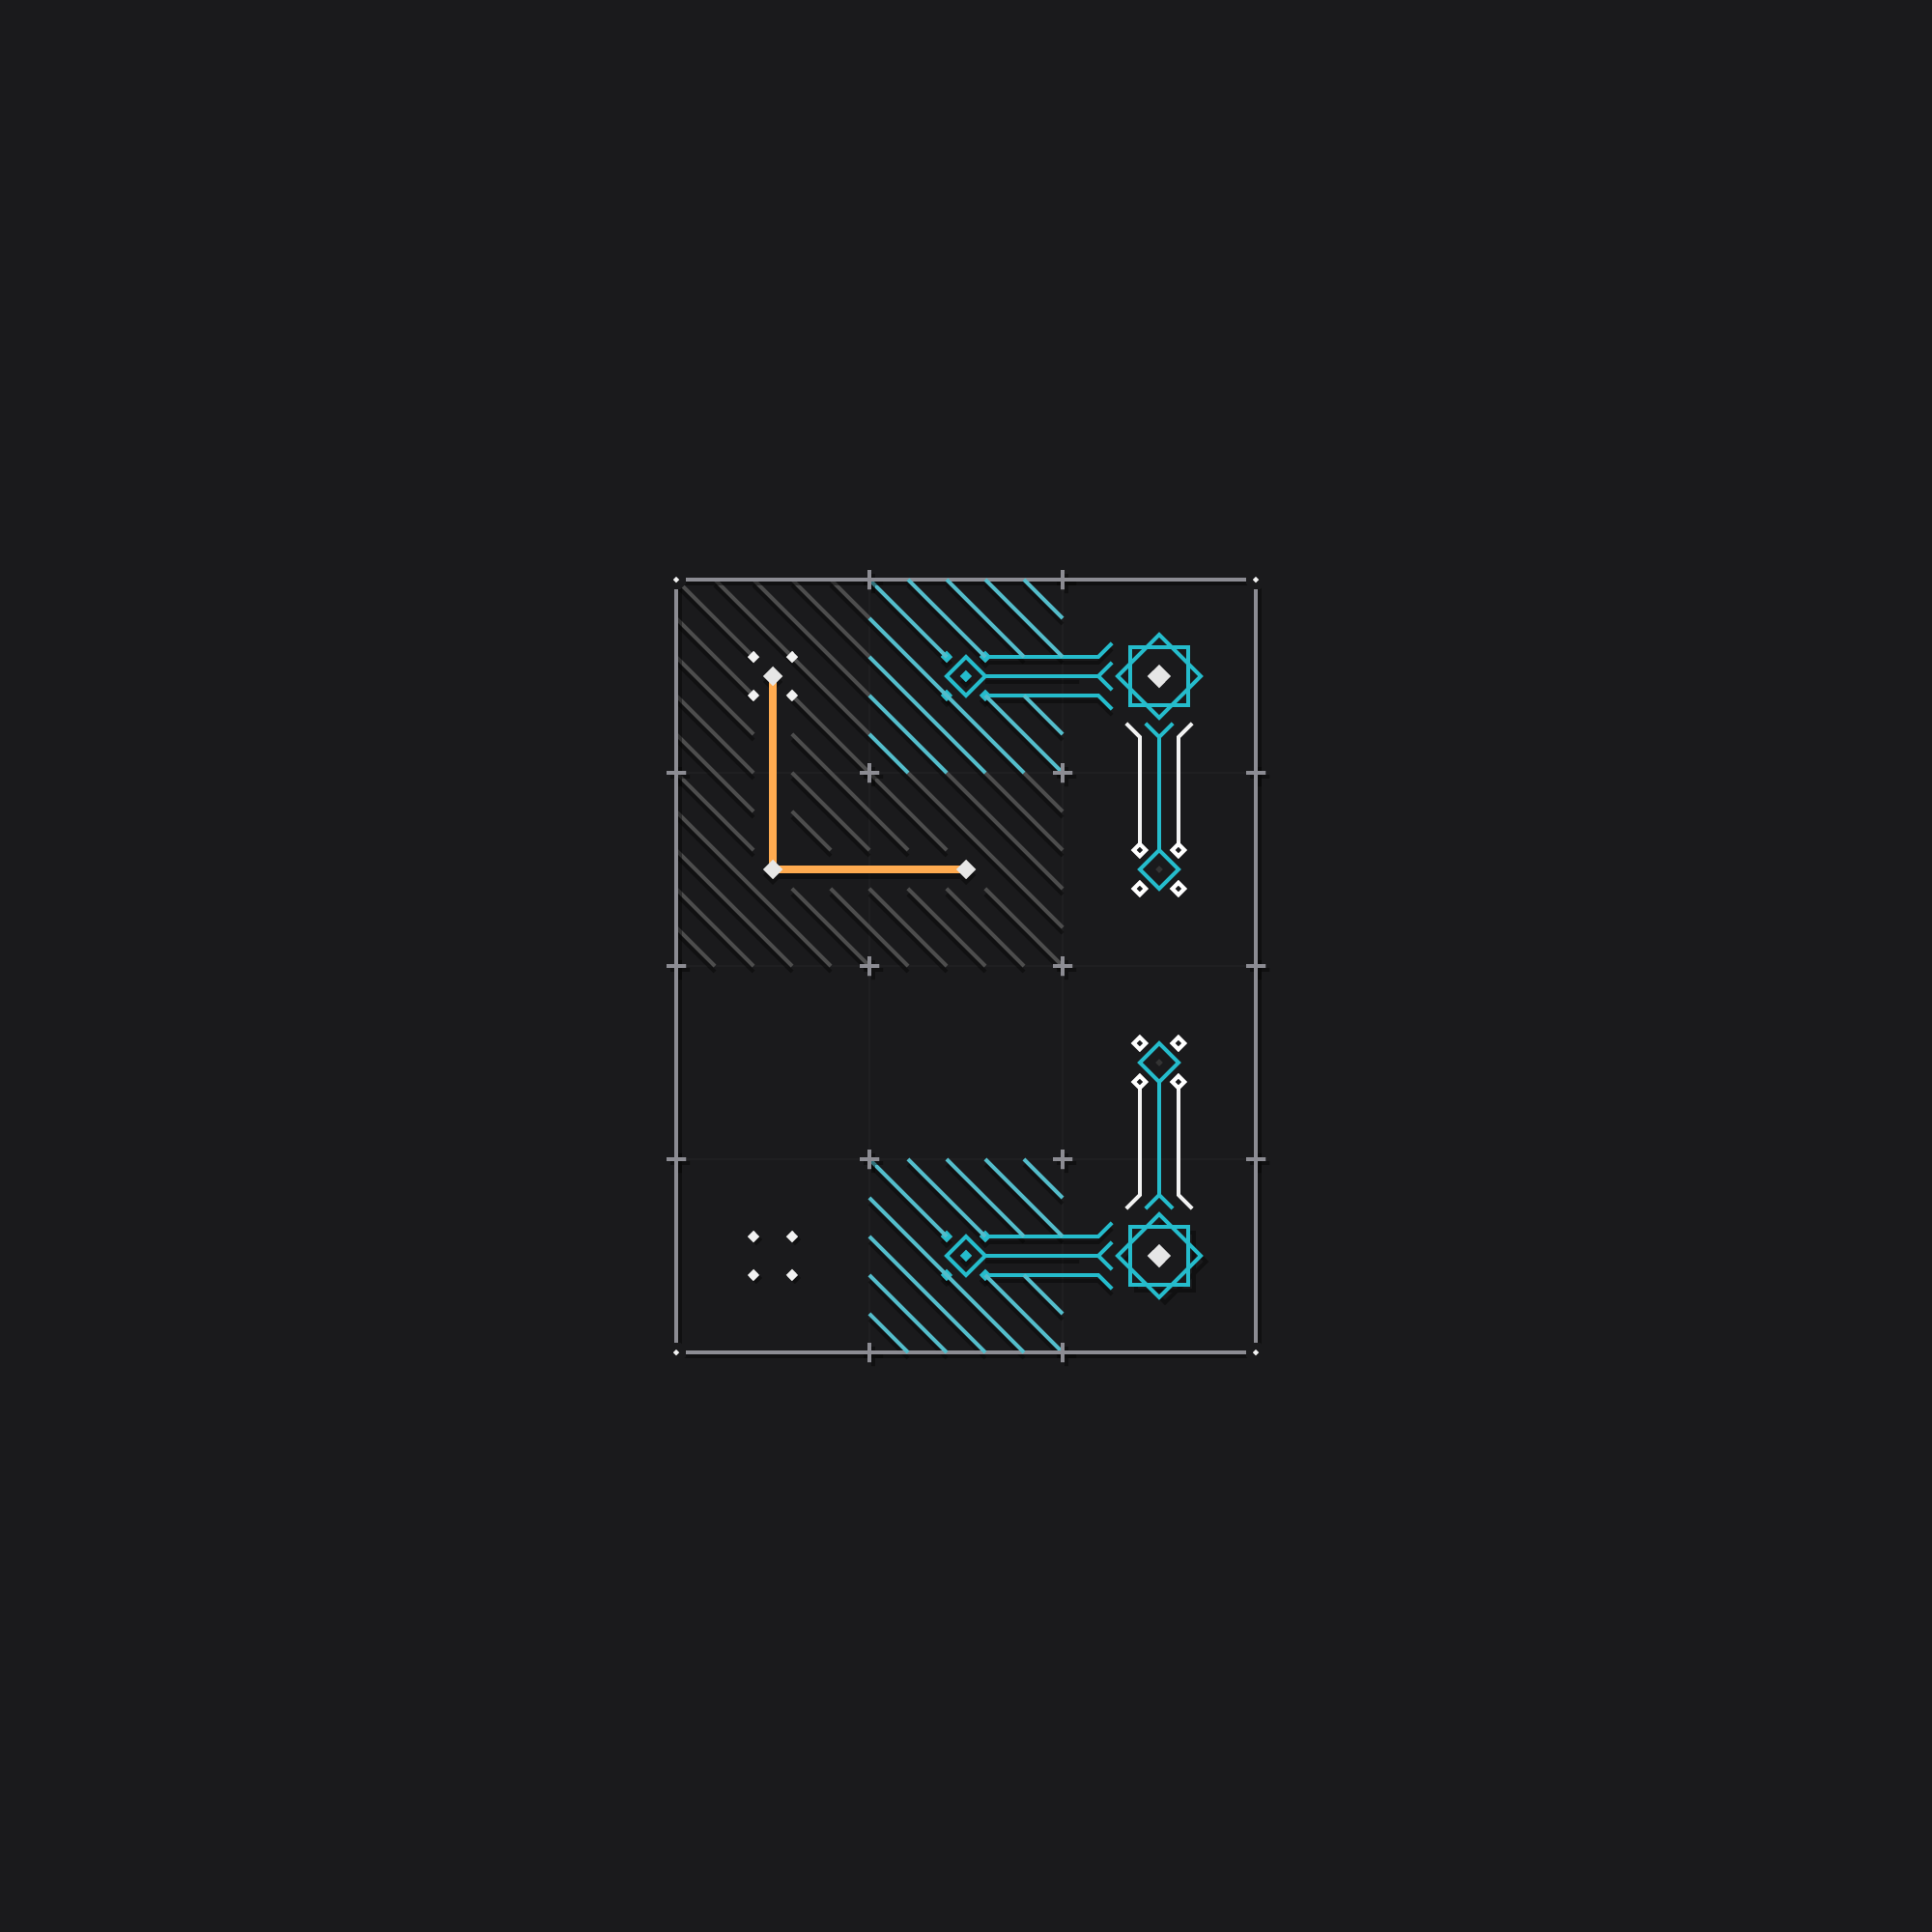 puzzle-depth-2.png